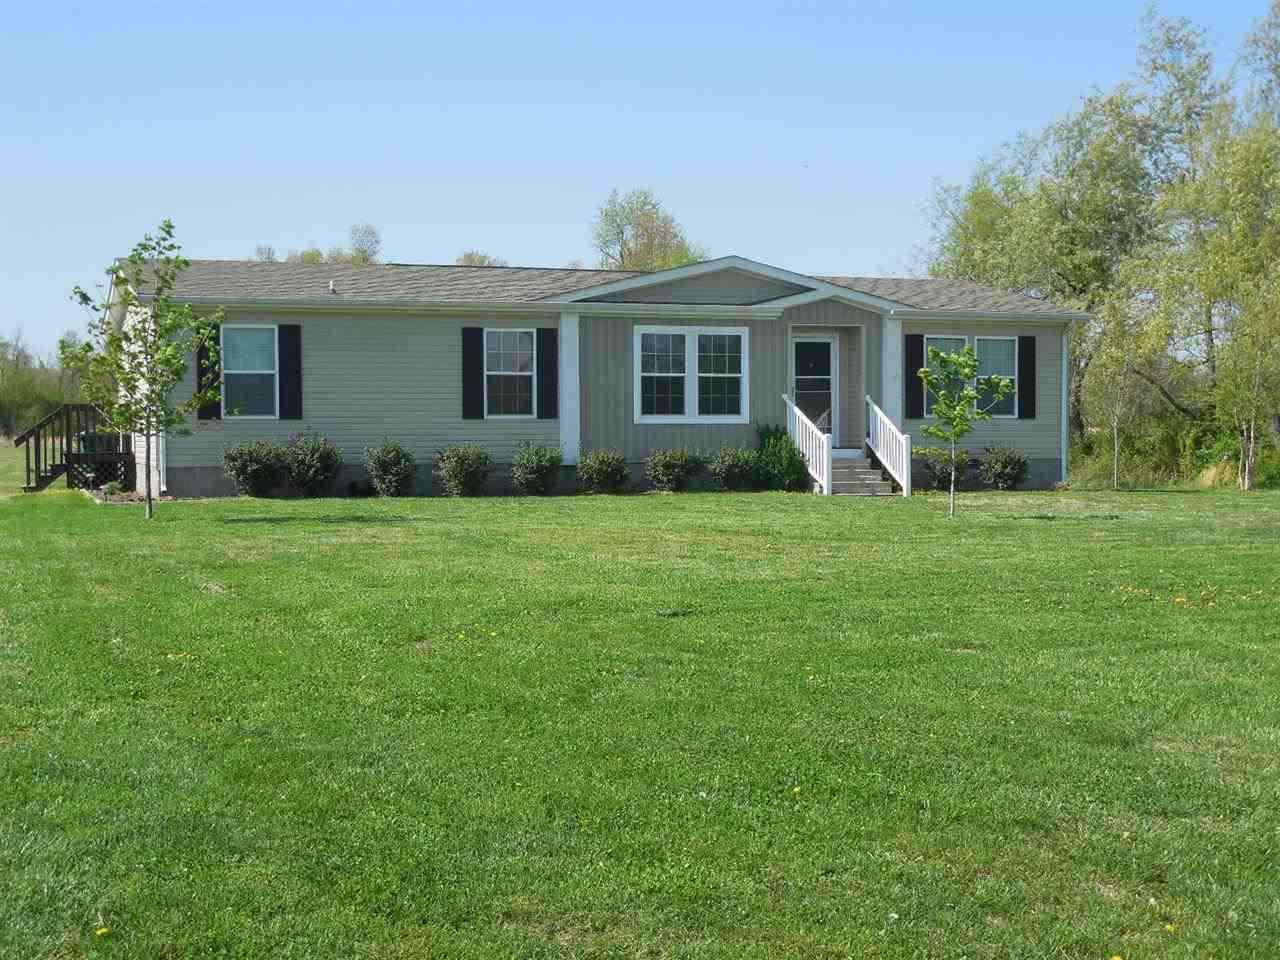 Real Estate for Sale, ListingId: 32667341, West Paducah,KY42086